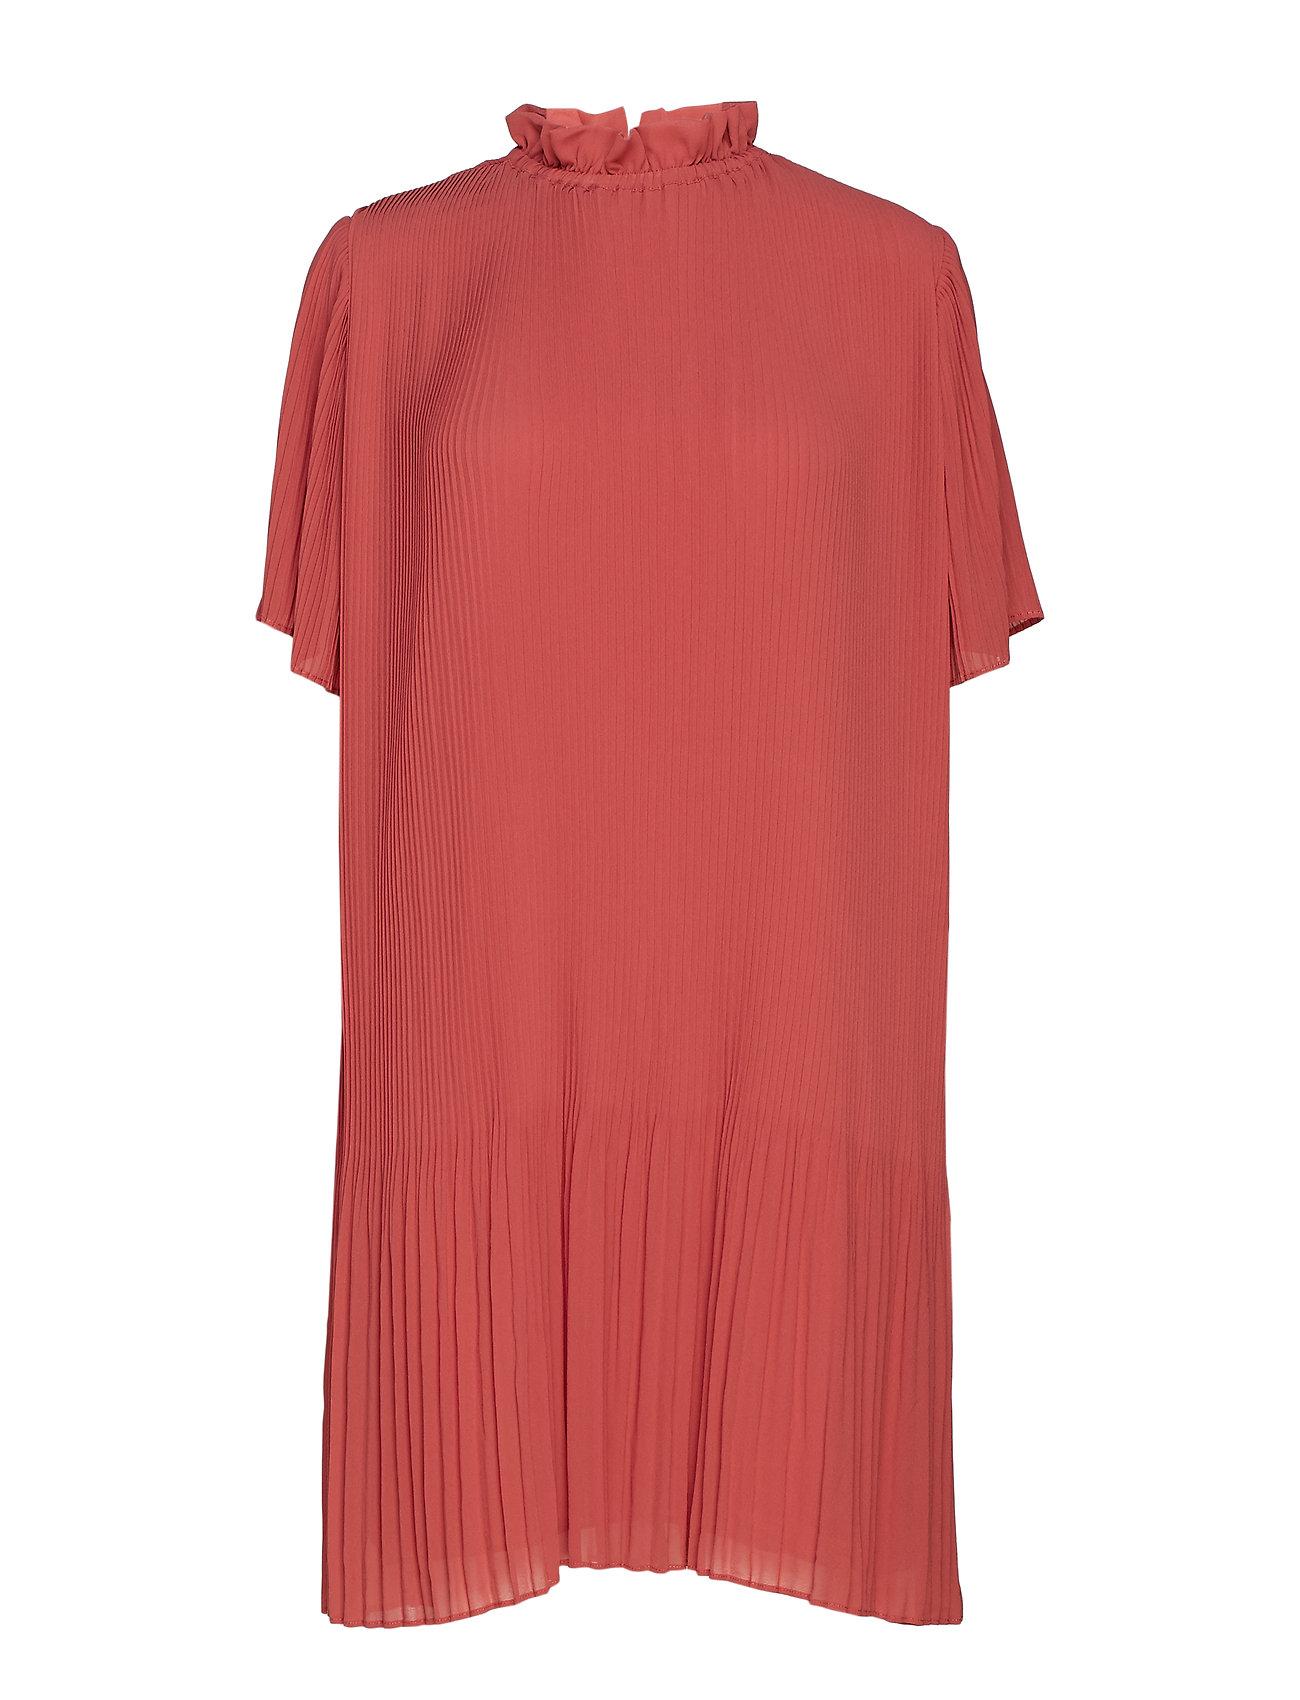 b72c0307212 Malie Ss Dress 6621 (Dusty Cedar) (560 kr) - Samsøe & Samsøe ...